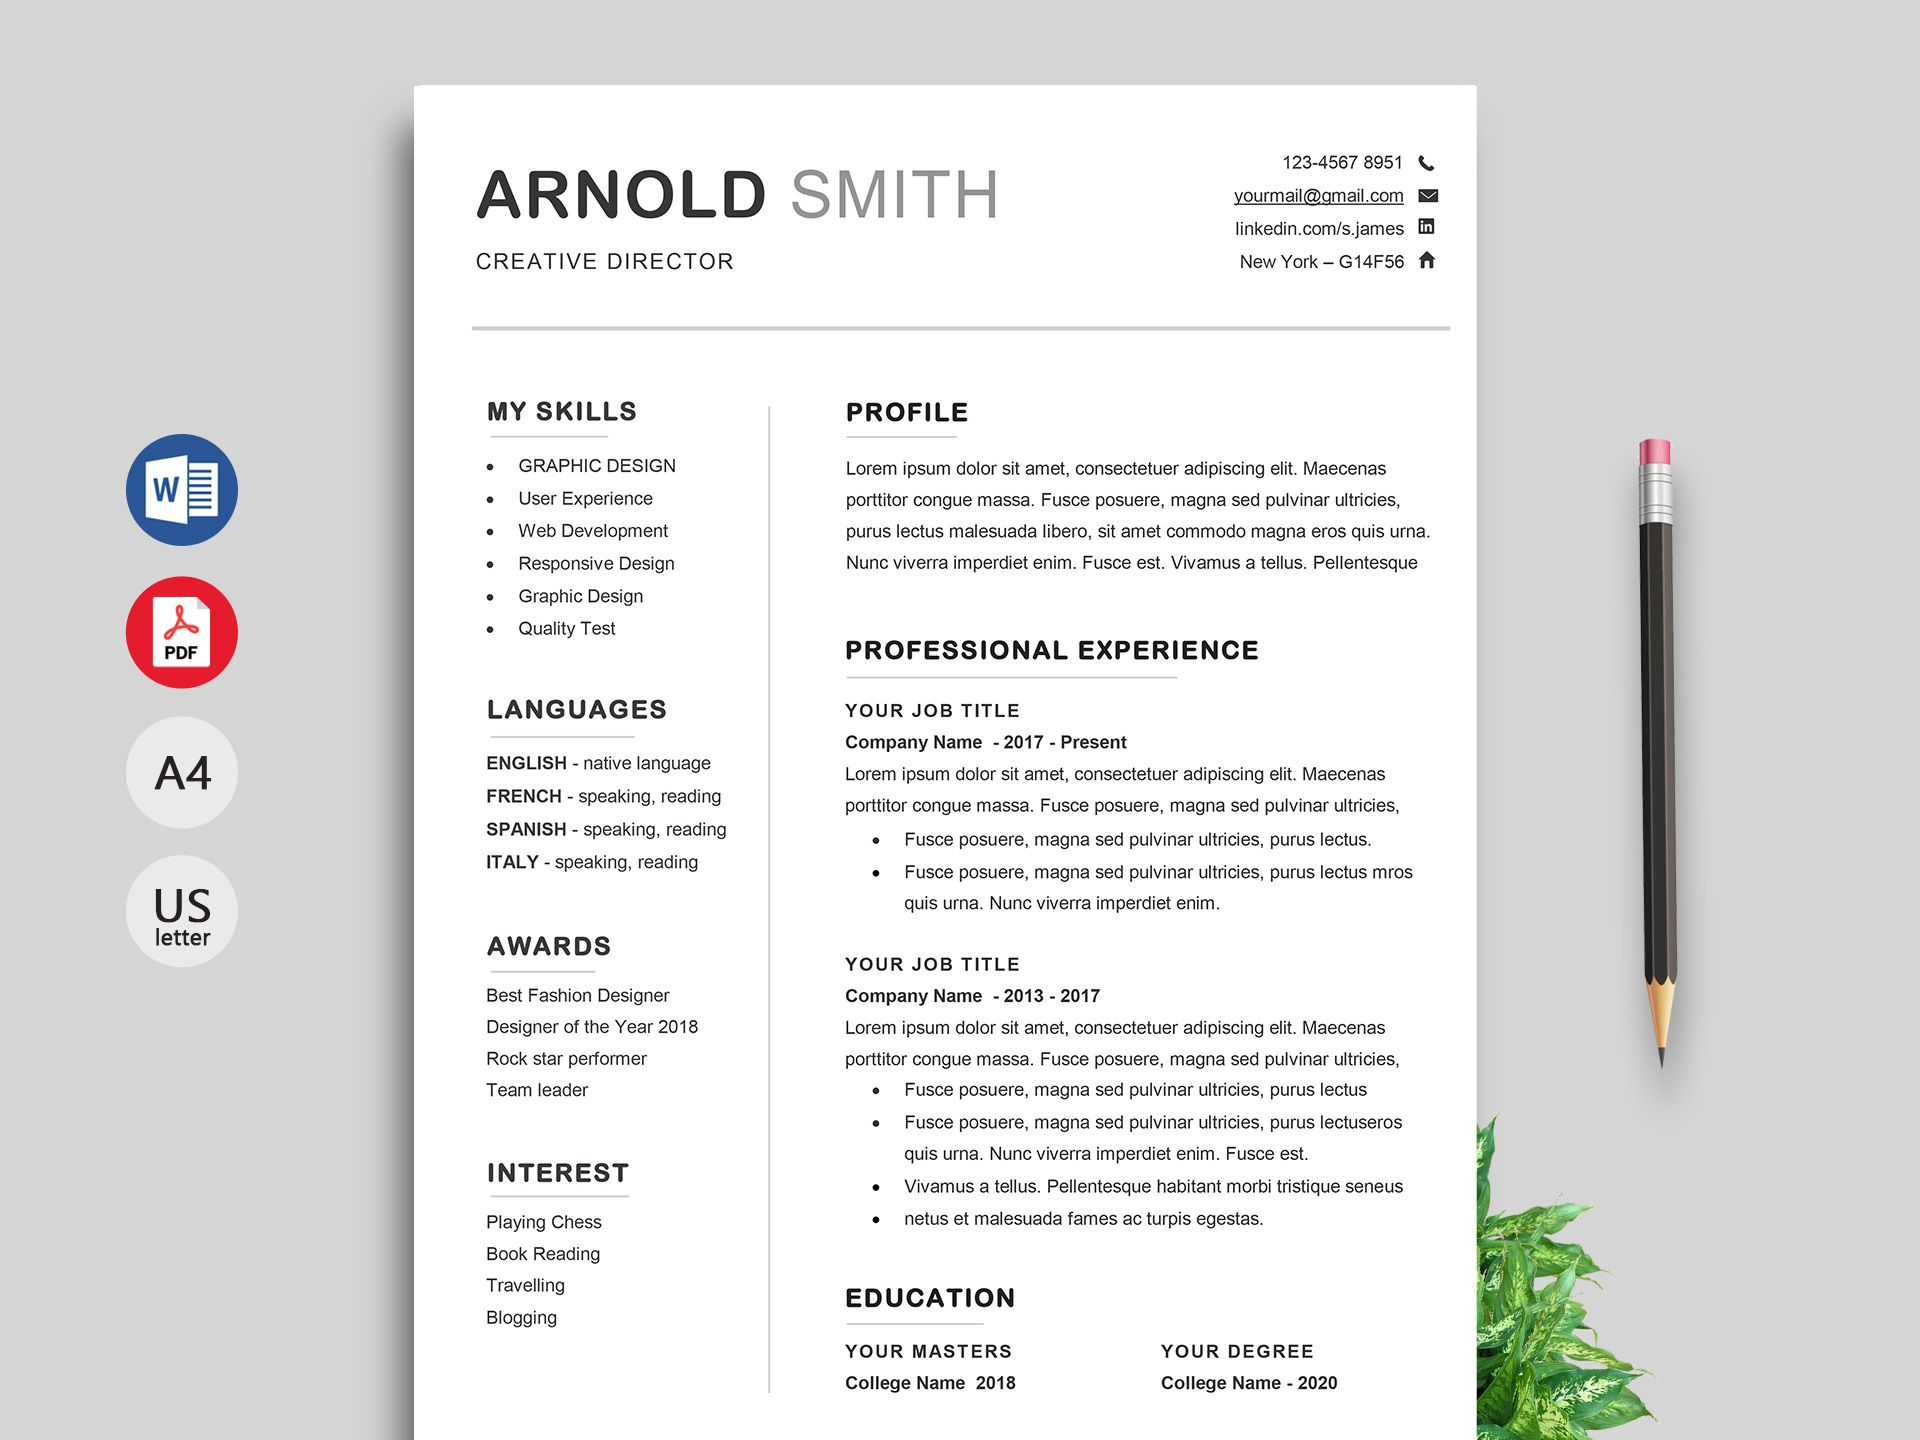 003 Impressive Creative Resume Template Free Download Photo  For Microsoft Word Fresher Cv DocFull